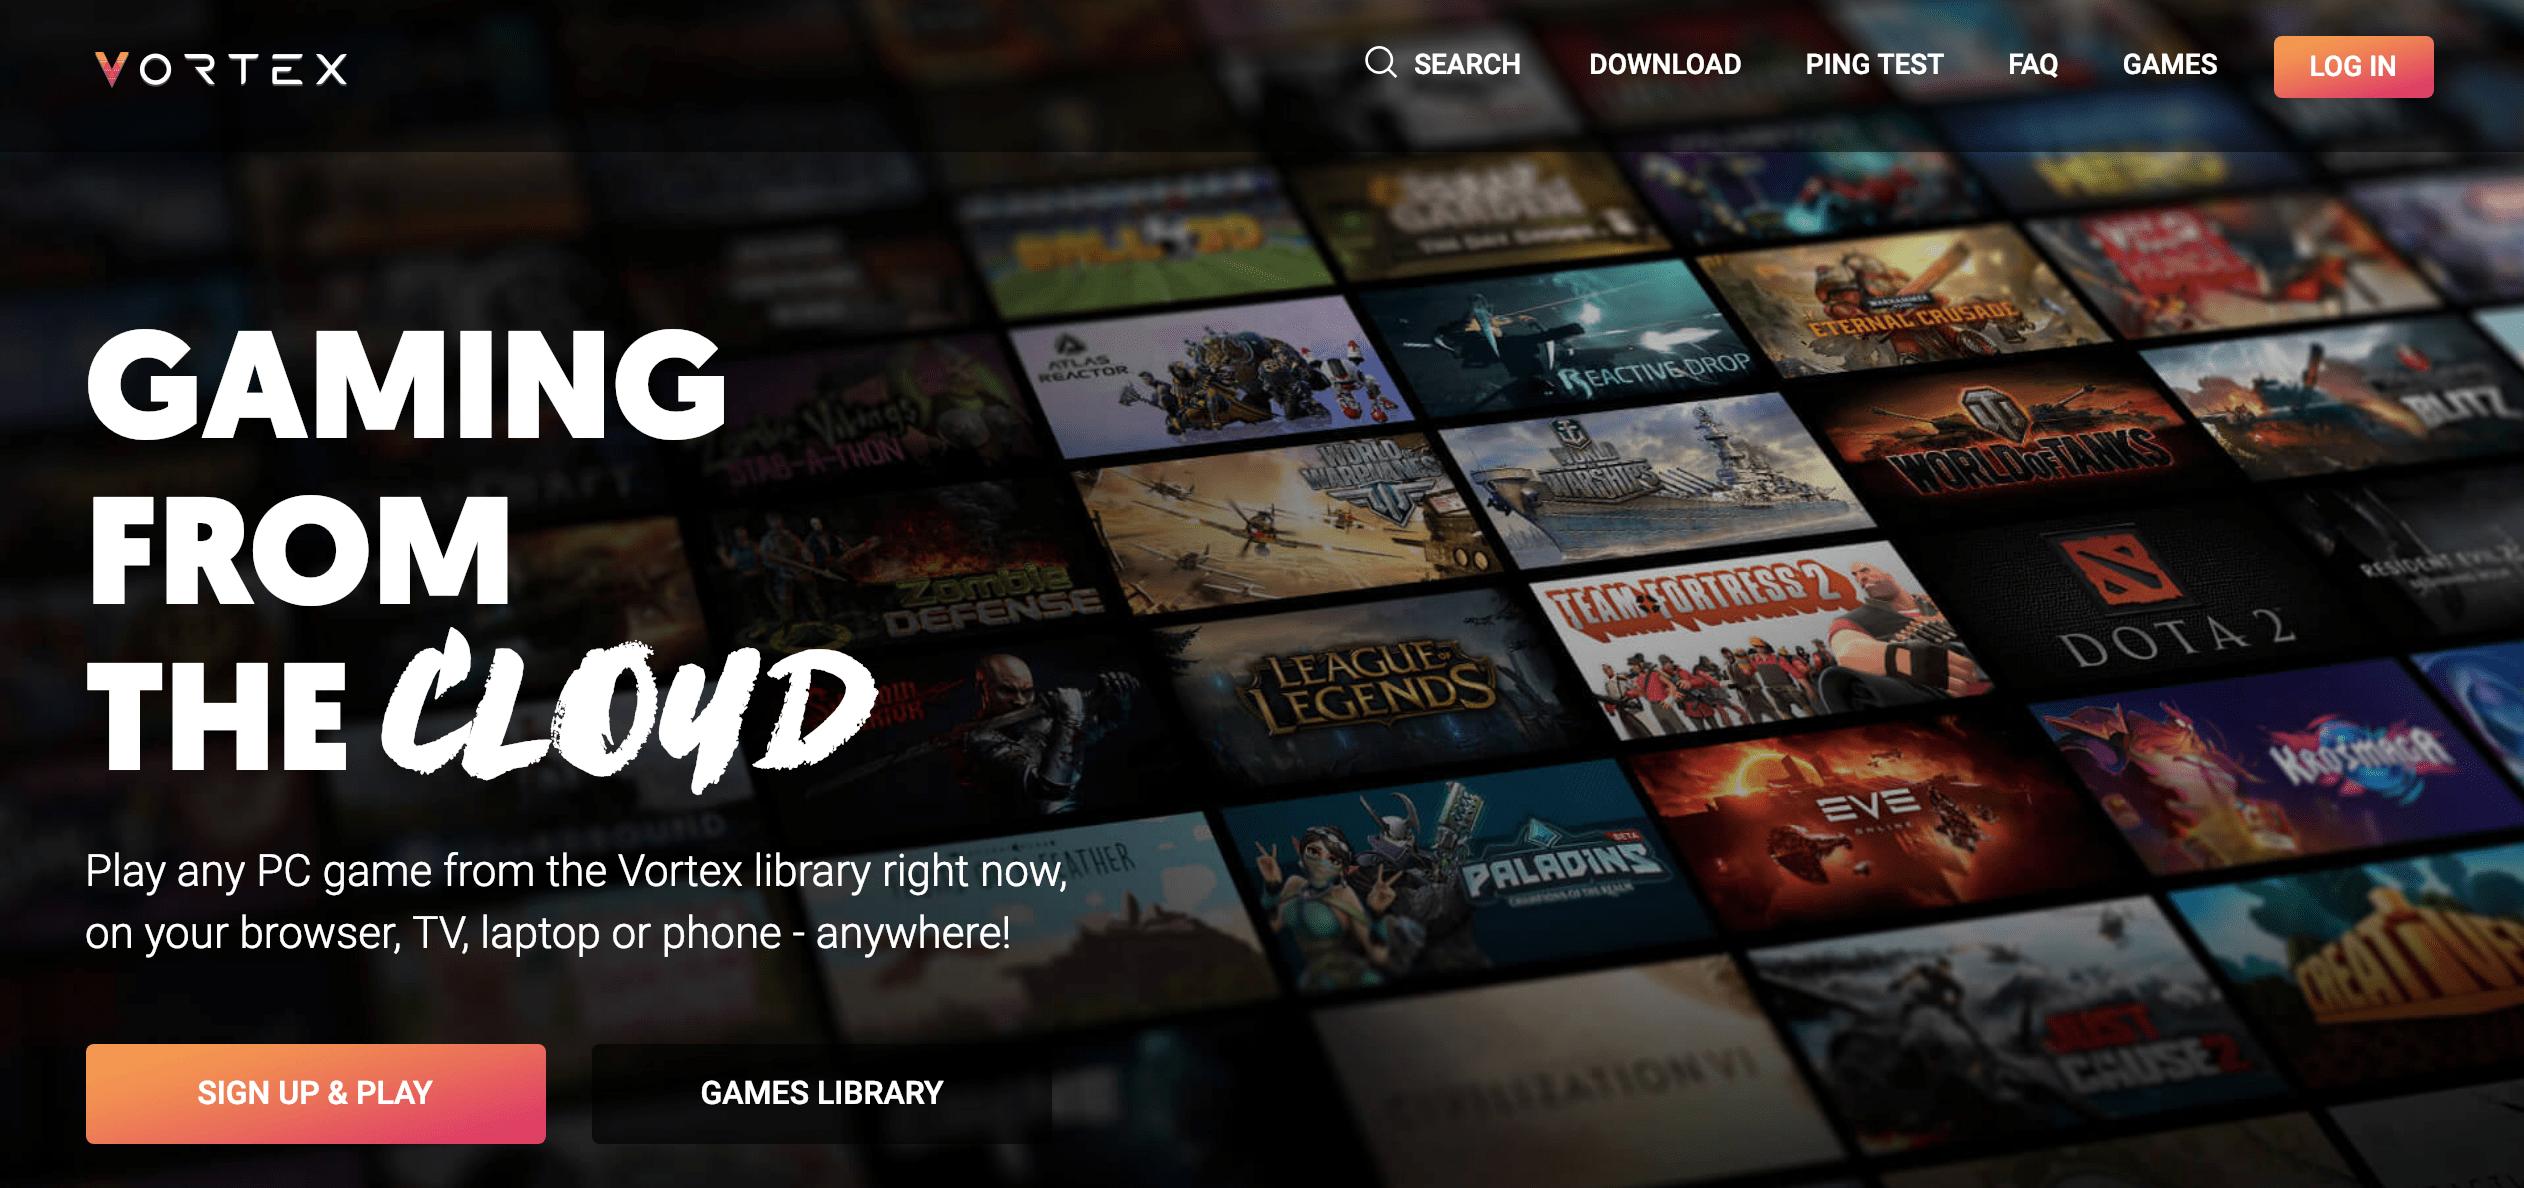 vortex cloud gaming services